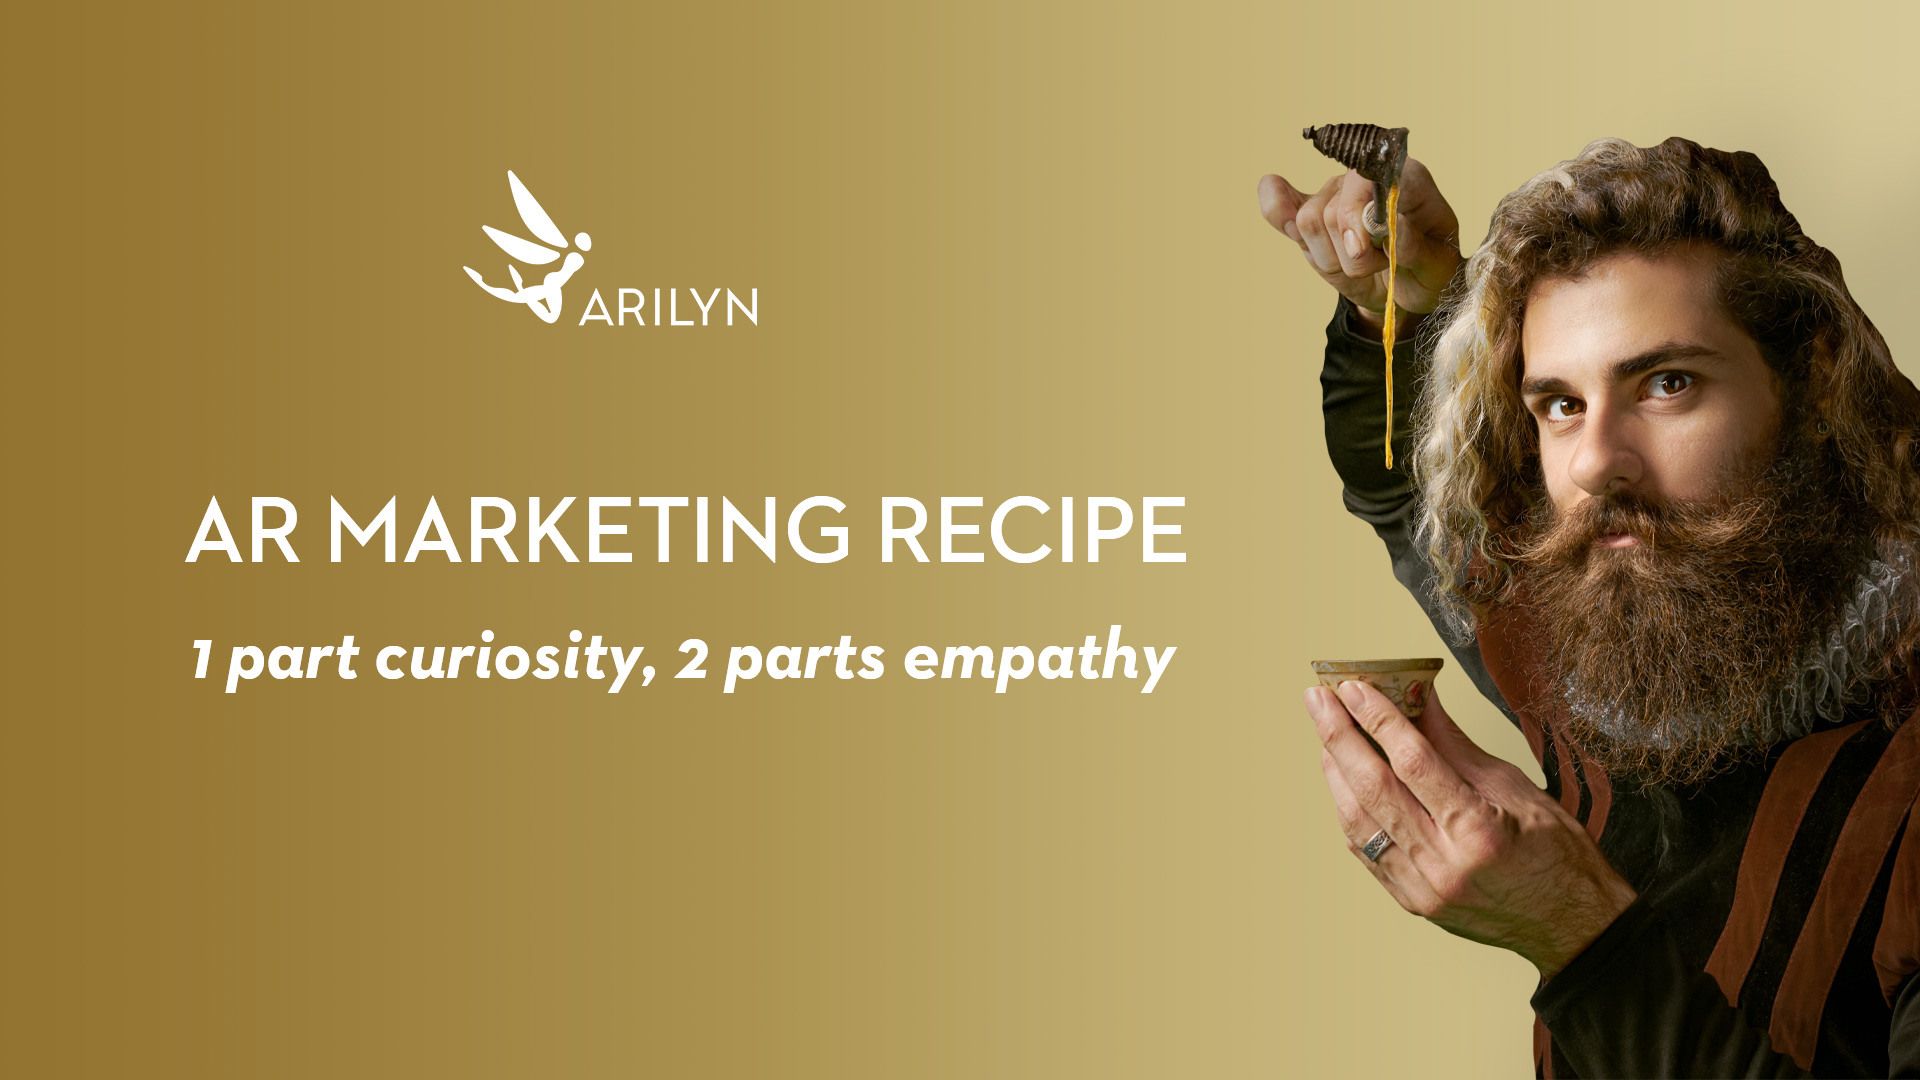 Recipe for success in AR marketing: 1 part curiosity, 2 parts empathy